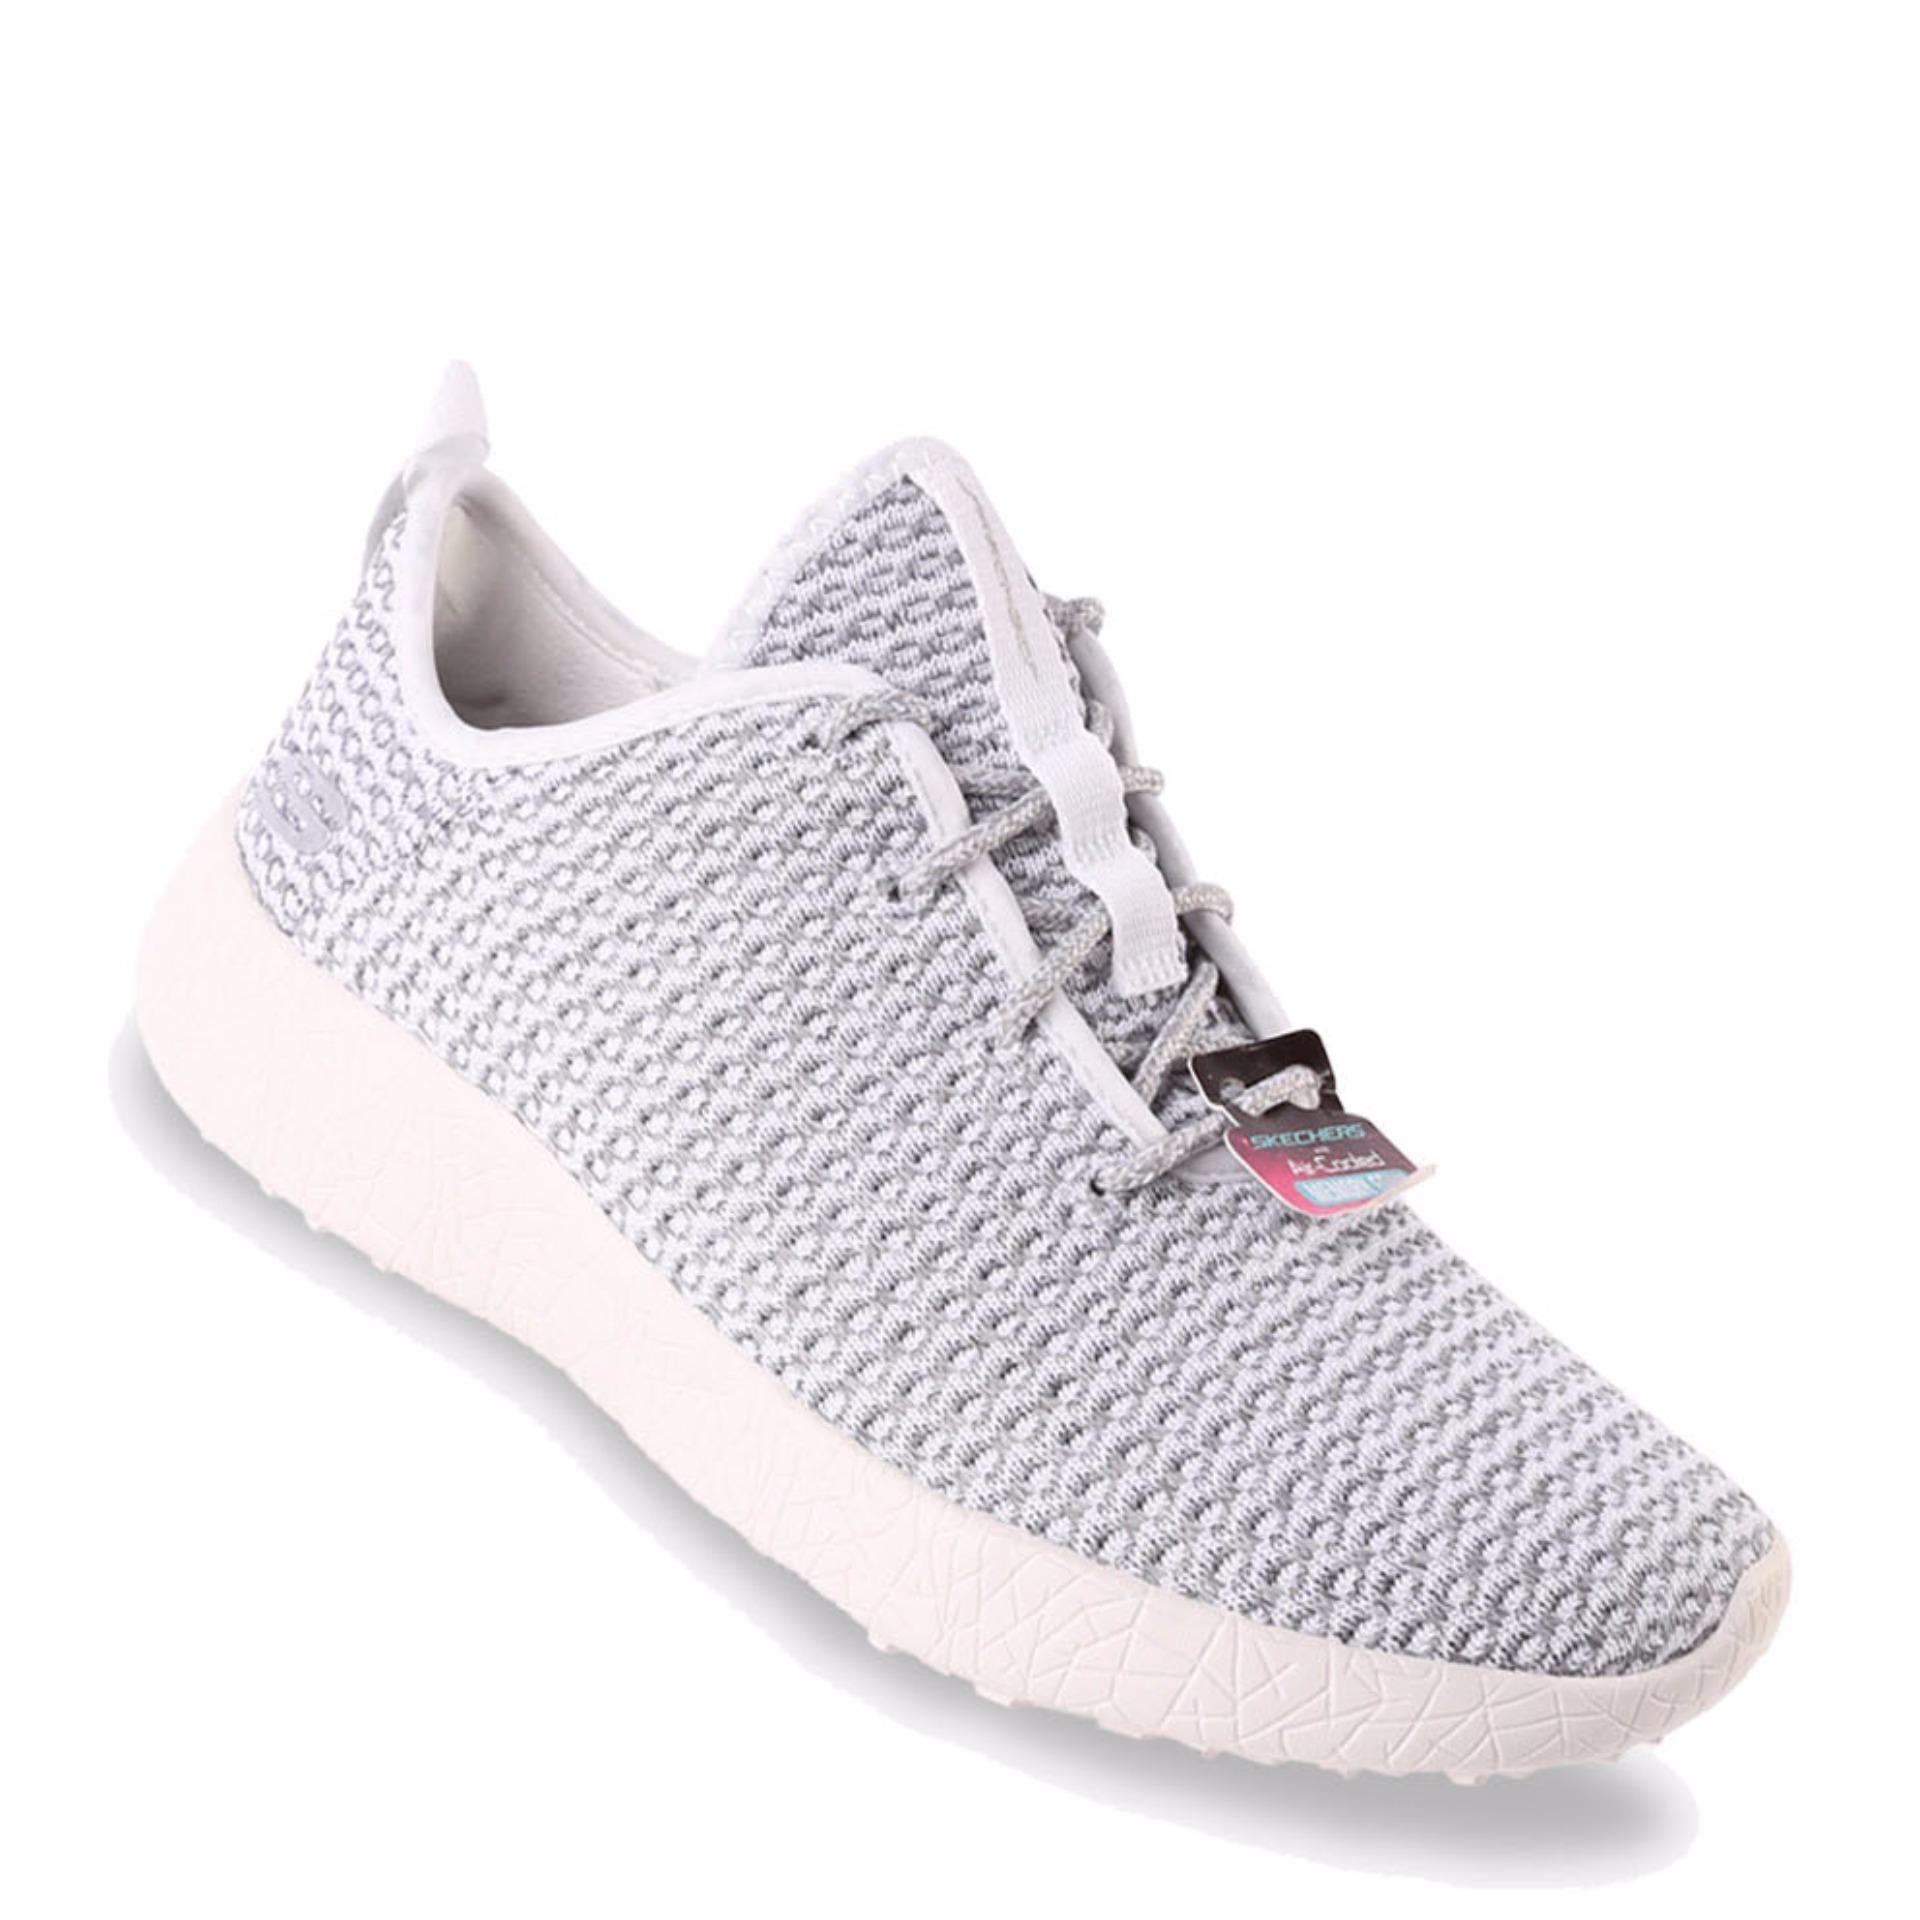 Skechers Gratis Sleek And Chic Sepatu Wanita Abu Abu - Daftar Harga ... 5484da3a36